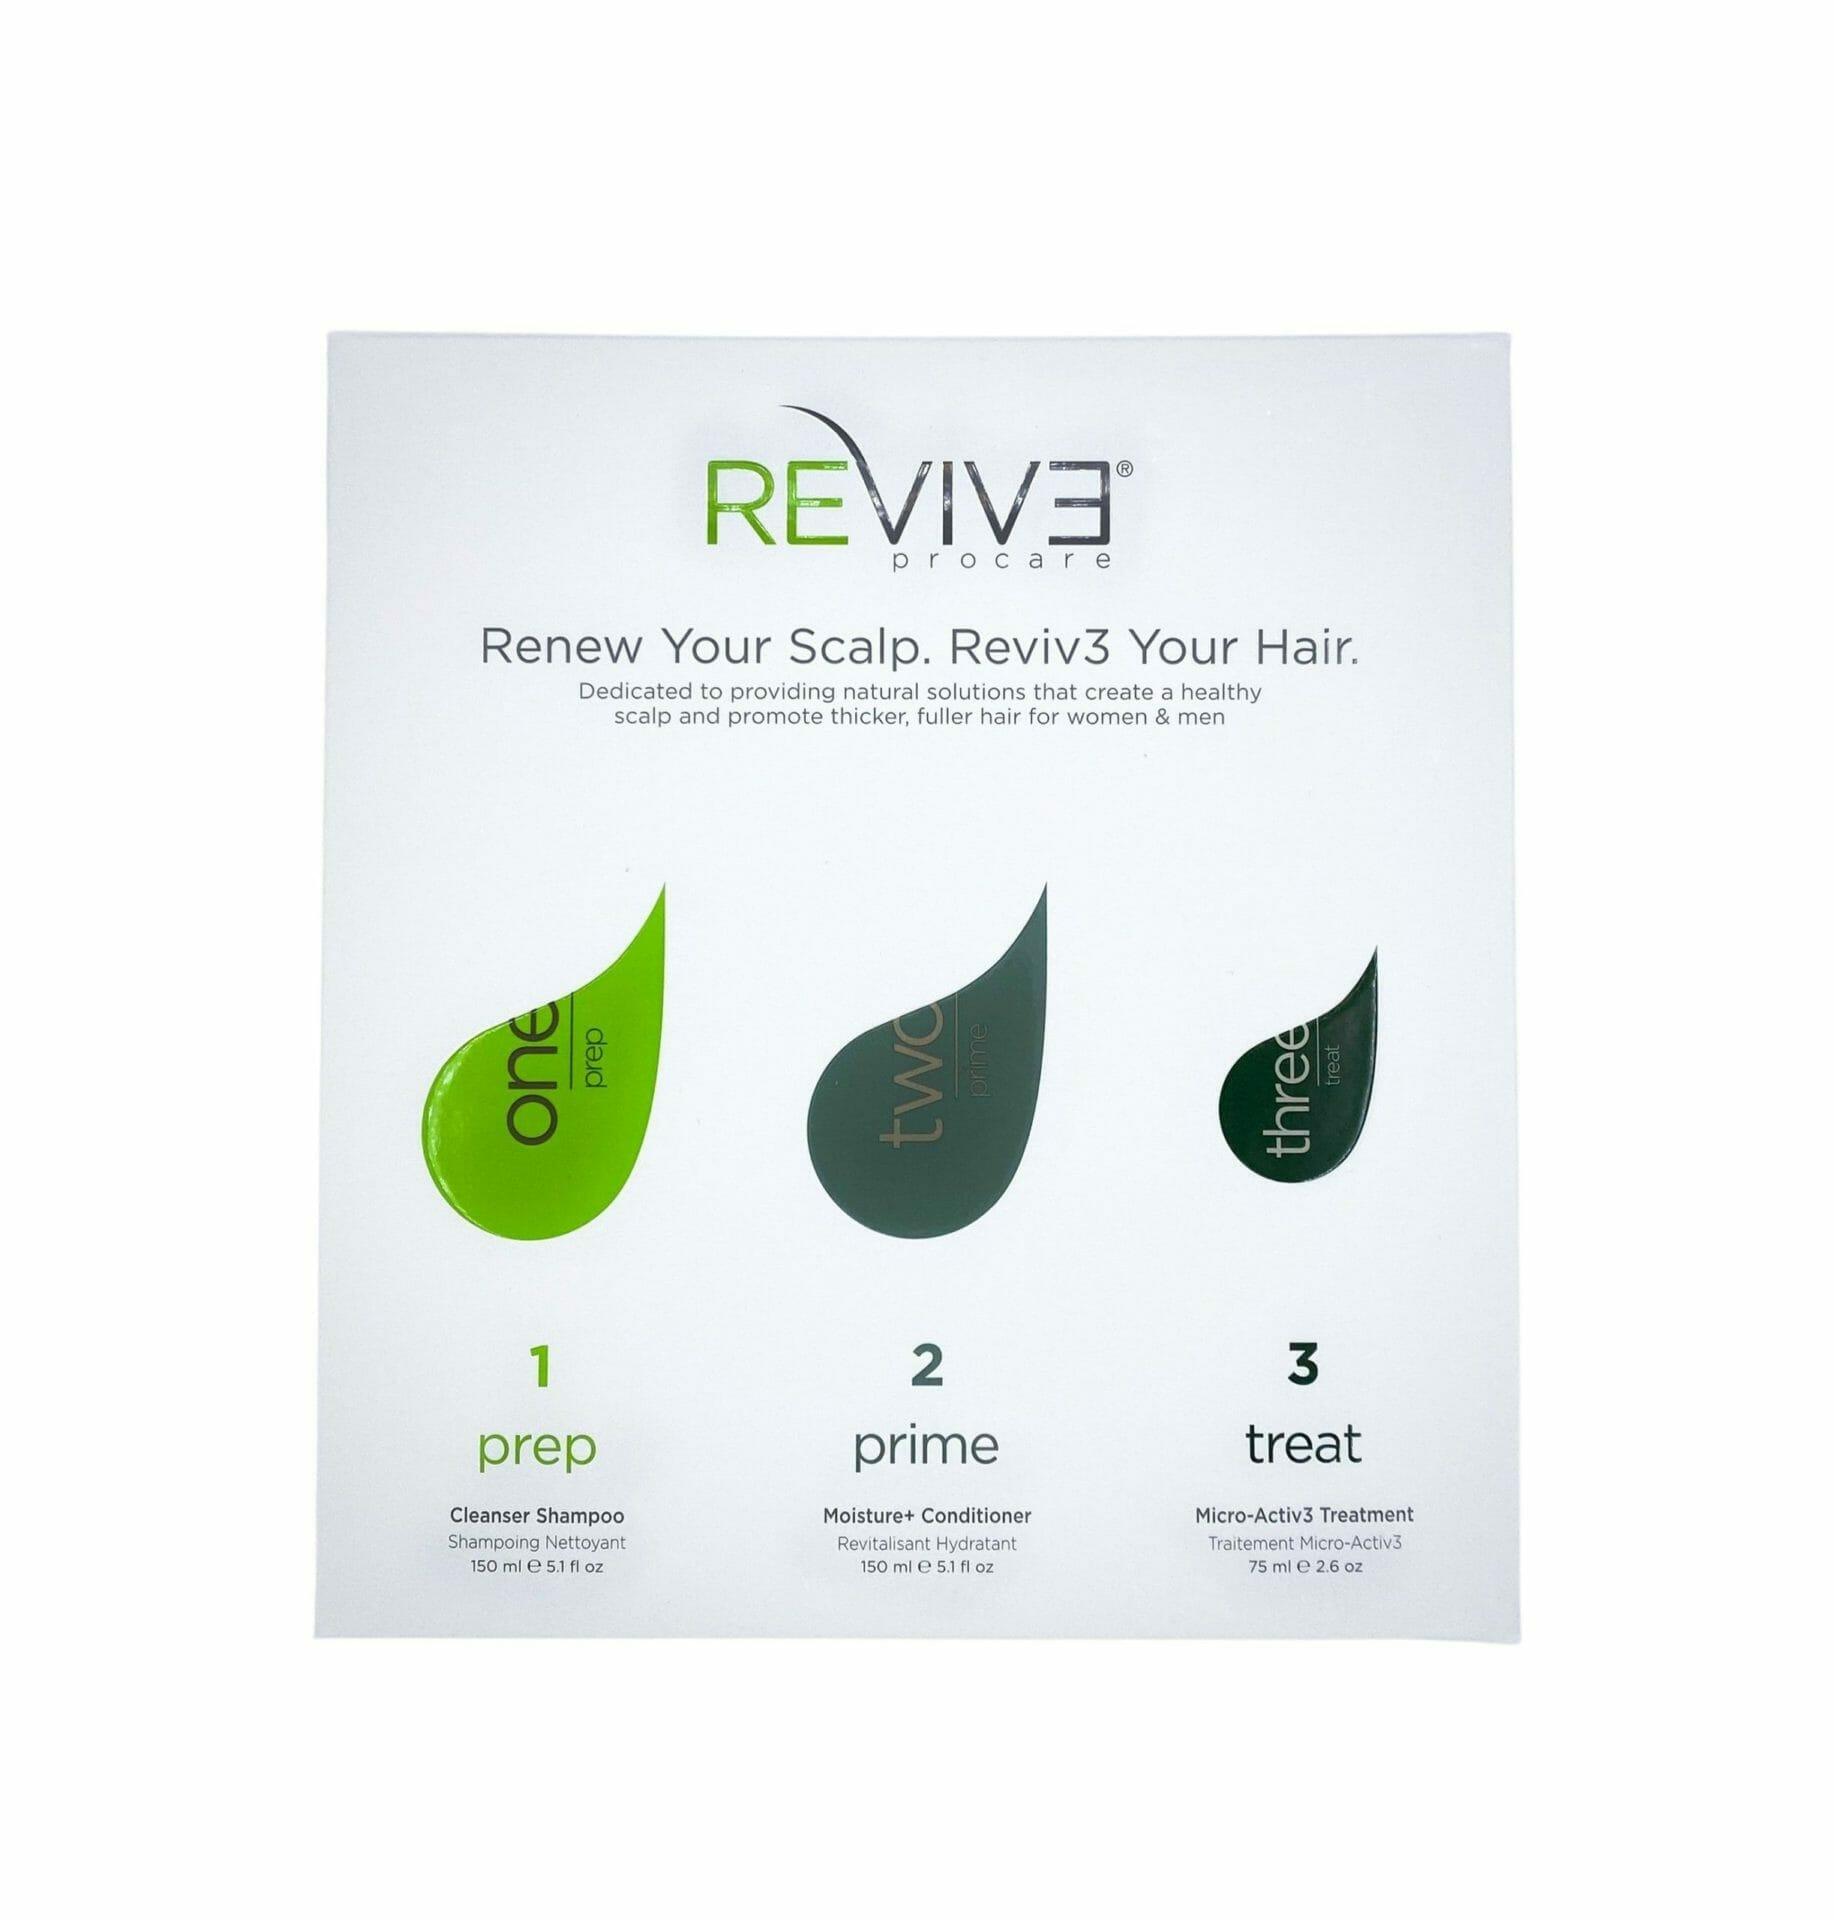 Revive 30 Day – 3 Part Starter Kit for Thin Hair